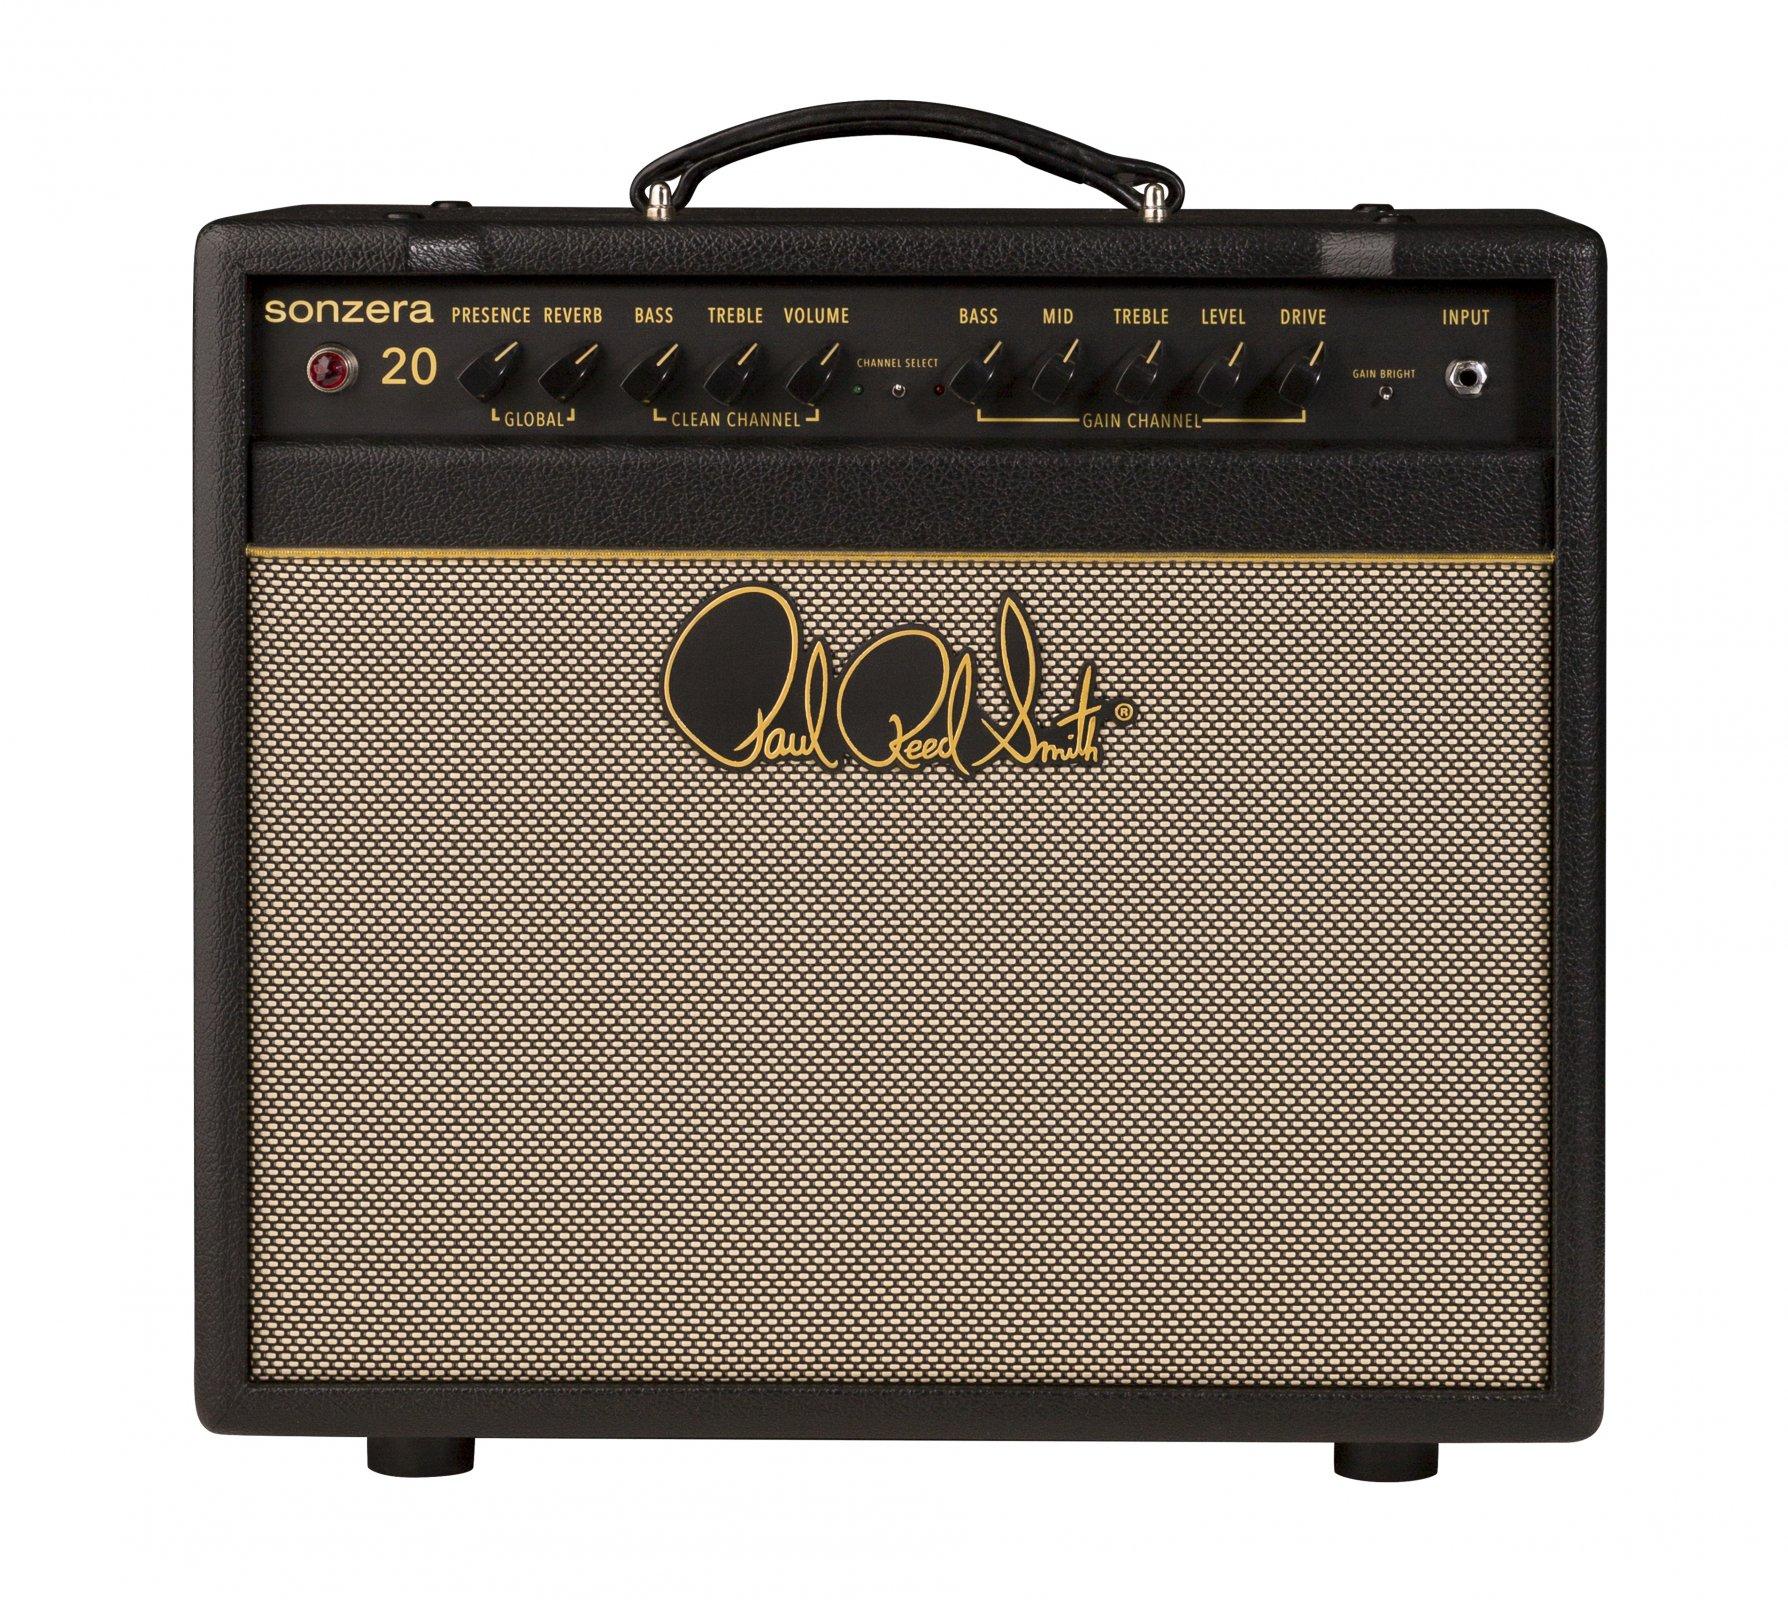 PRS Sonzera 50 Watt Combo Amplifier